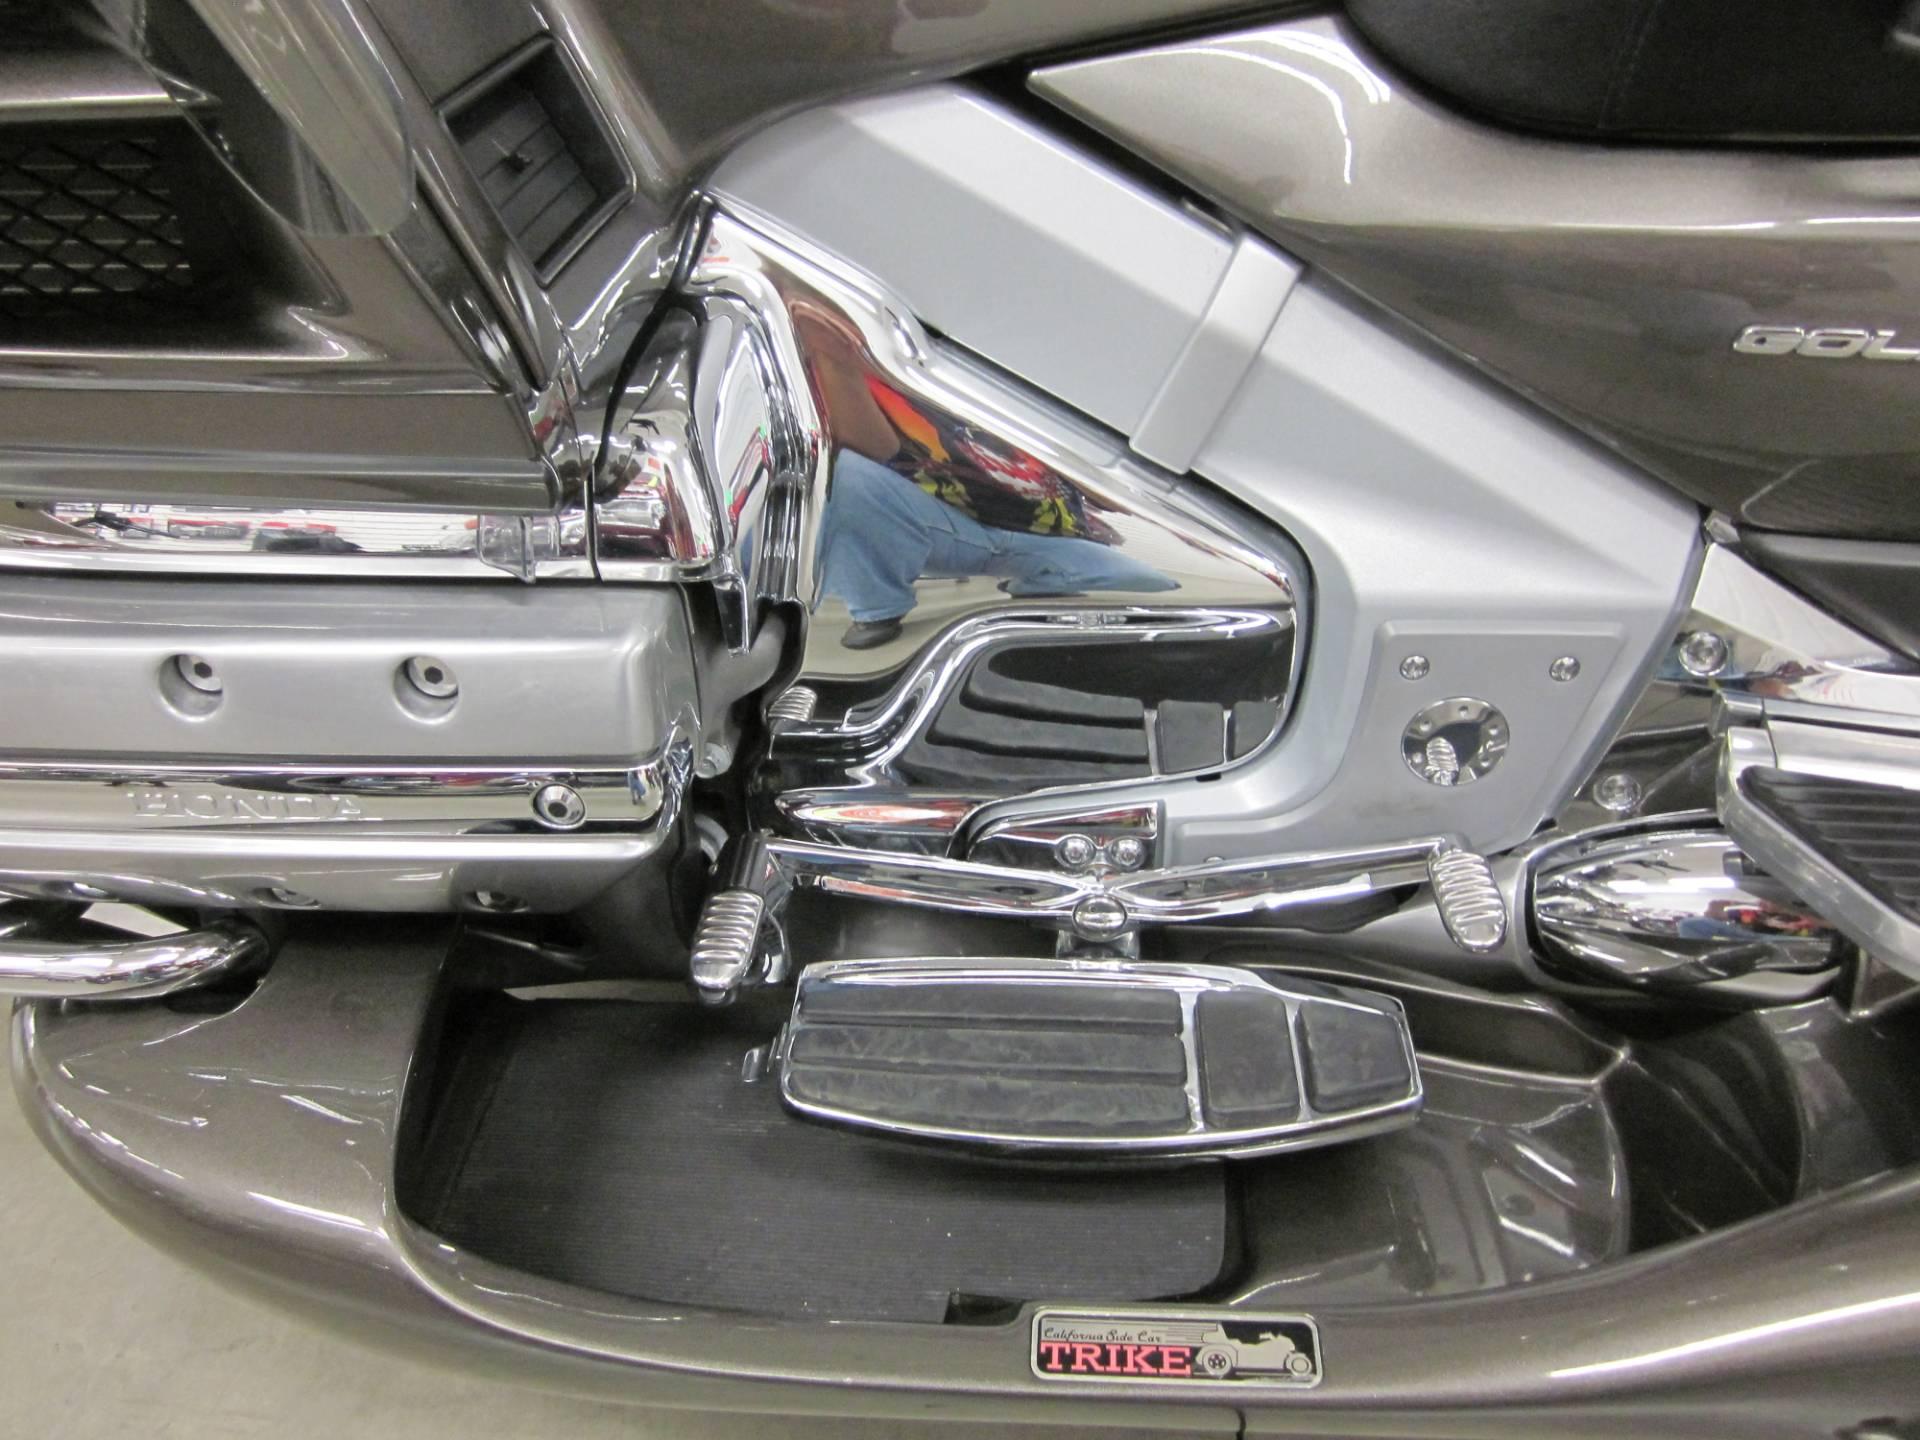 2010 California Sidecar GL1800 Cobra in Lima, Ohio